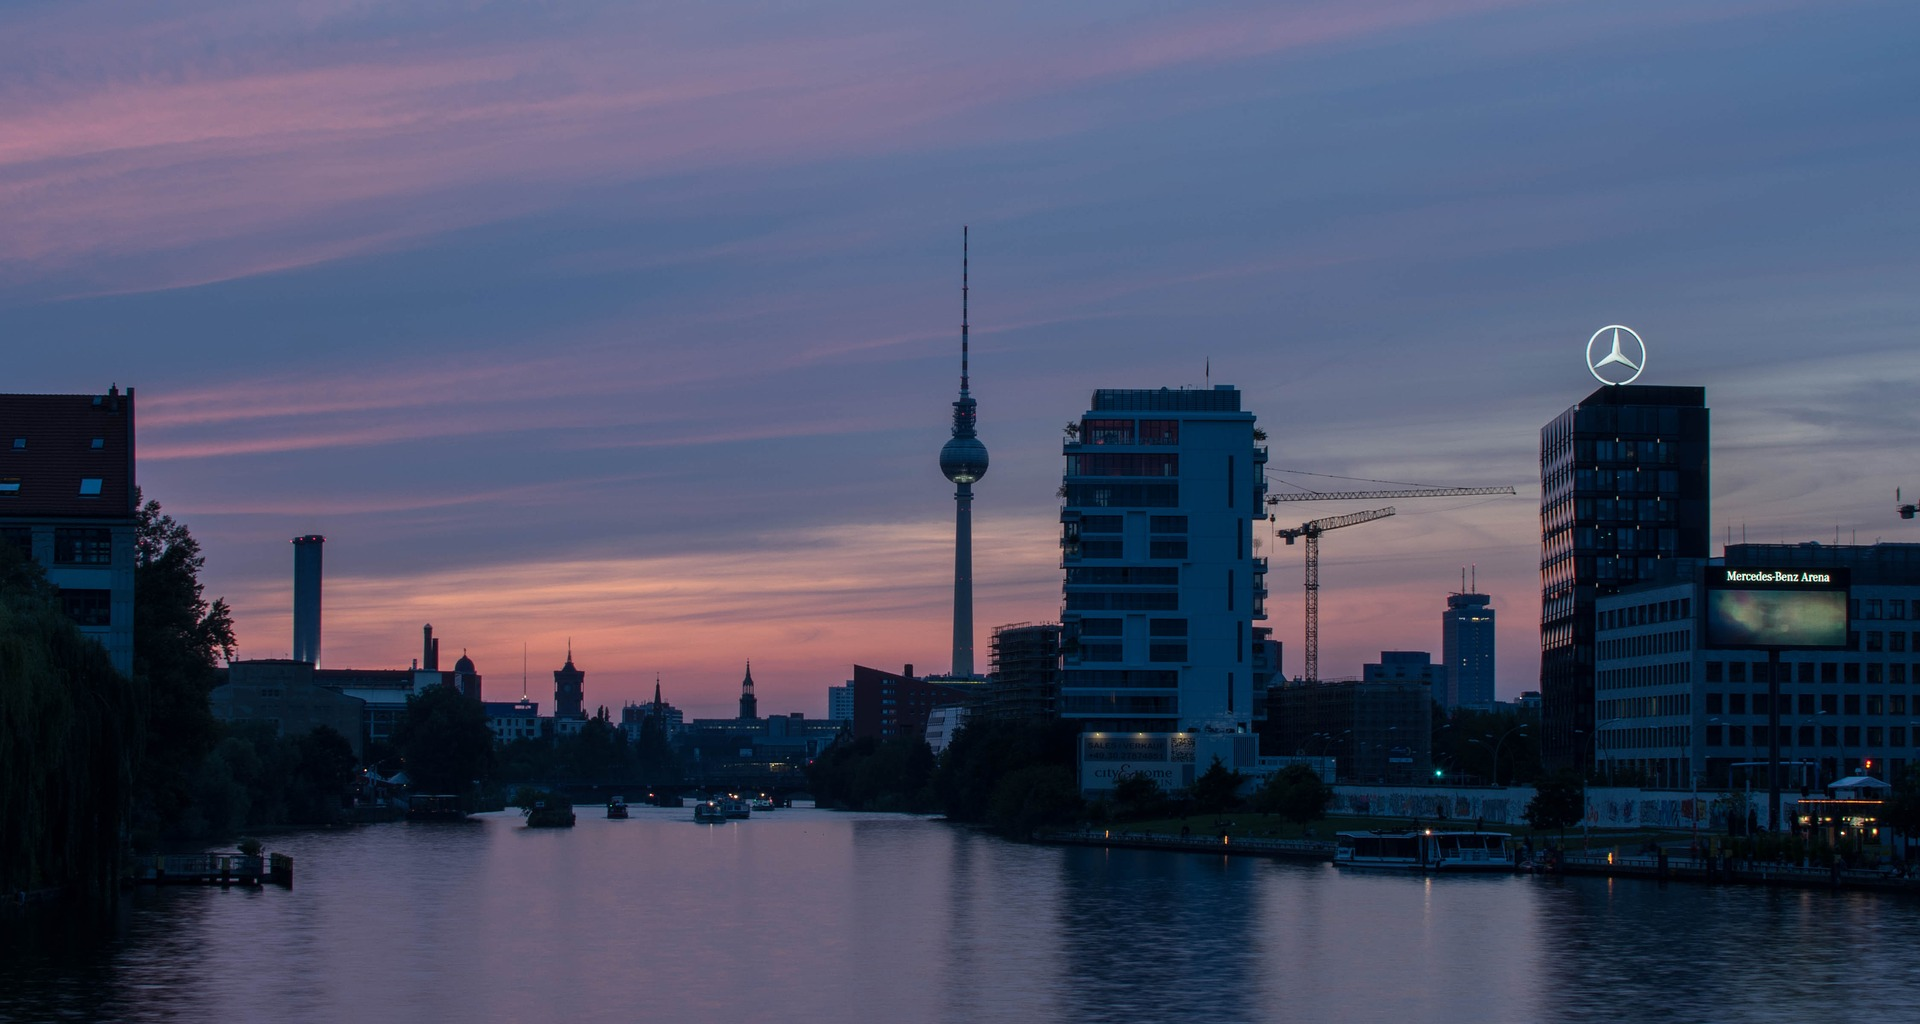 Berlin © emkanicepic / Pixabay